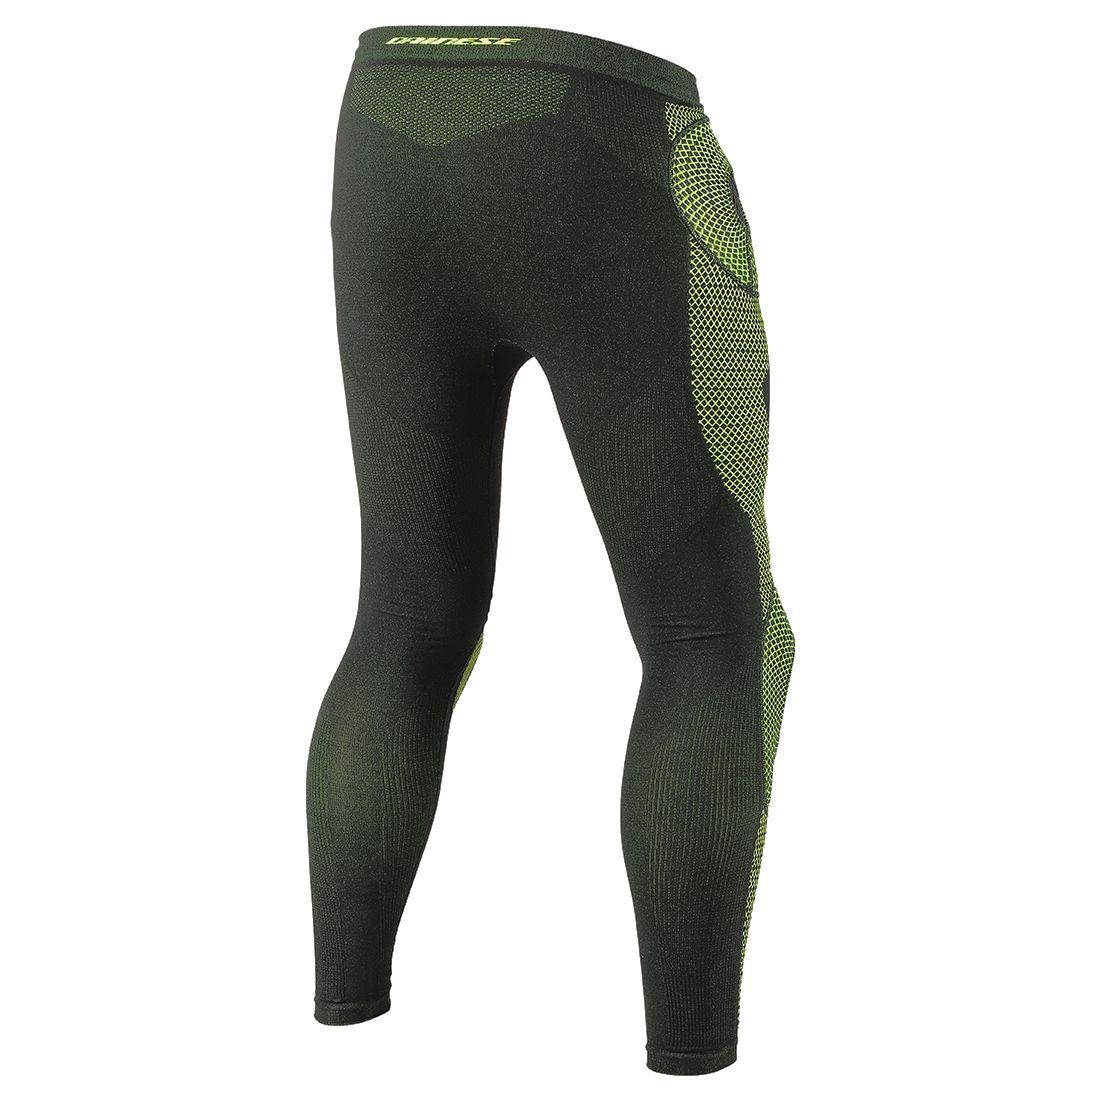 【DAINESE】D-CORE    ARMOR 防護內穿褲 LP - 「Webike-摩托百貨」